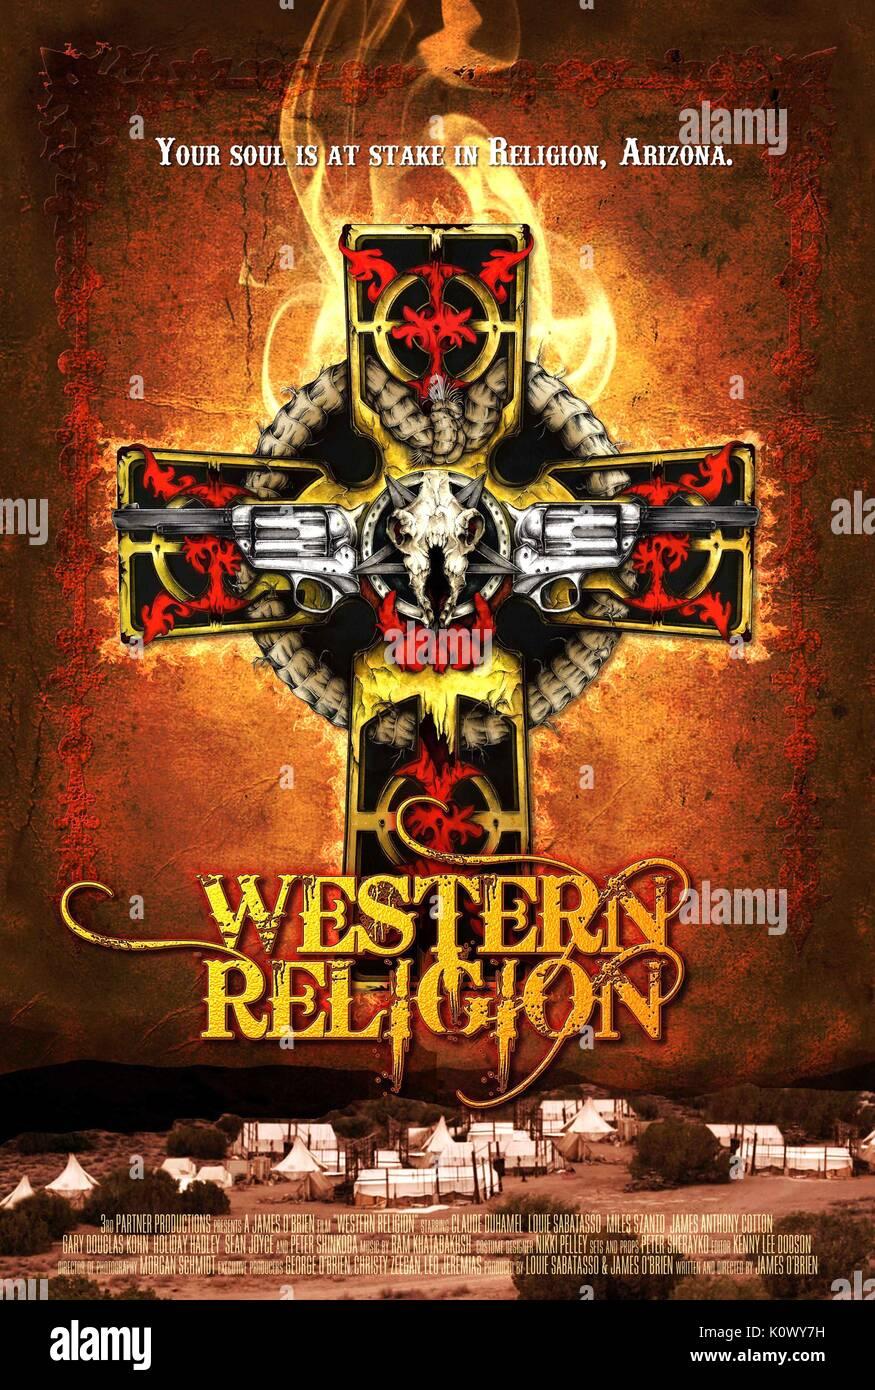 MOVIE POSTER WESTERN RELIGION (2015) - Stock Image